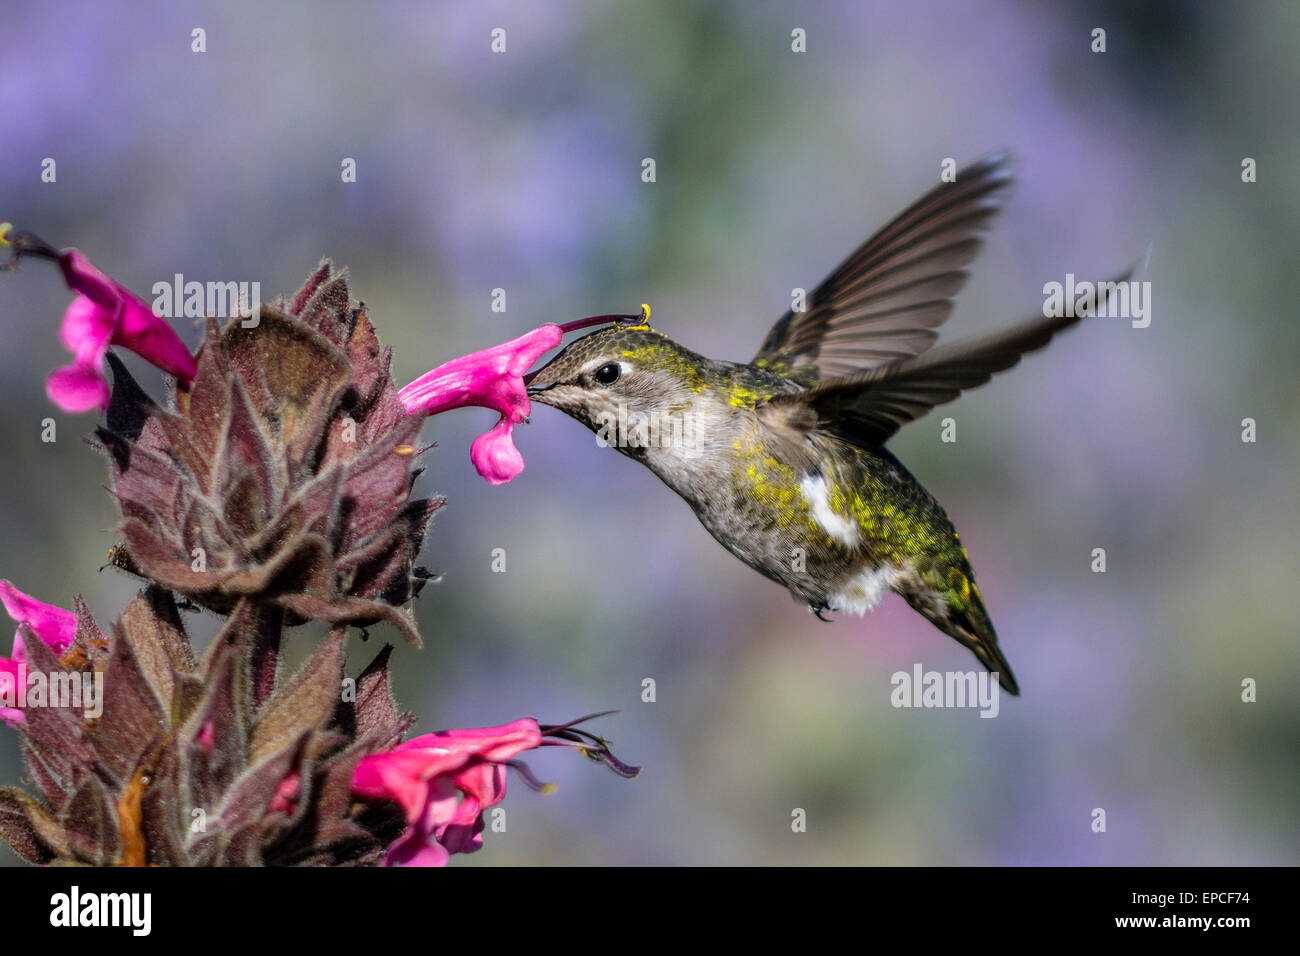 anna's hummingbird, calypte anna - Stock Image